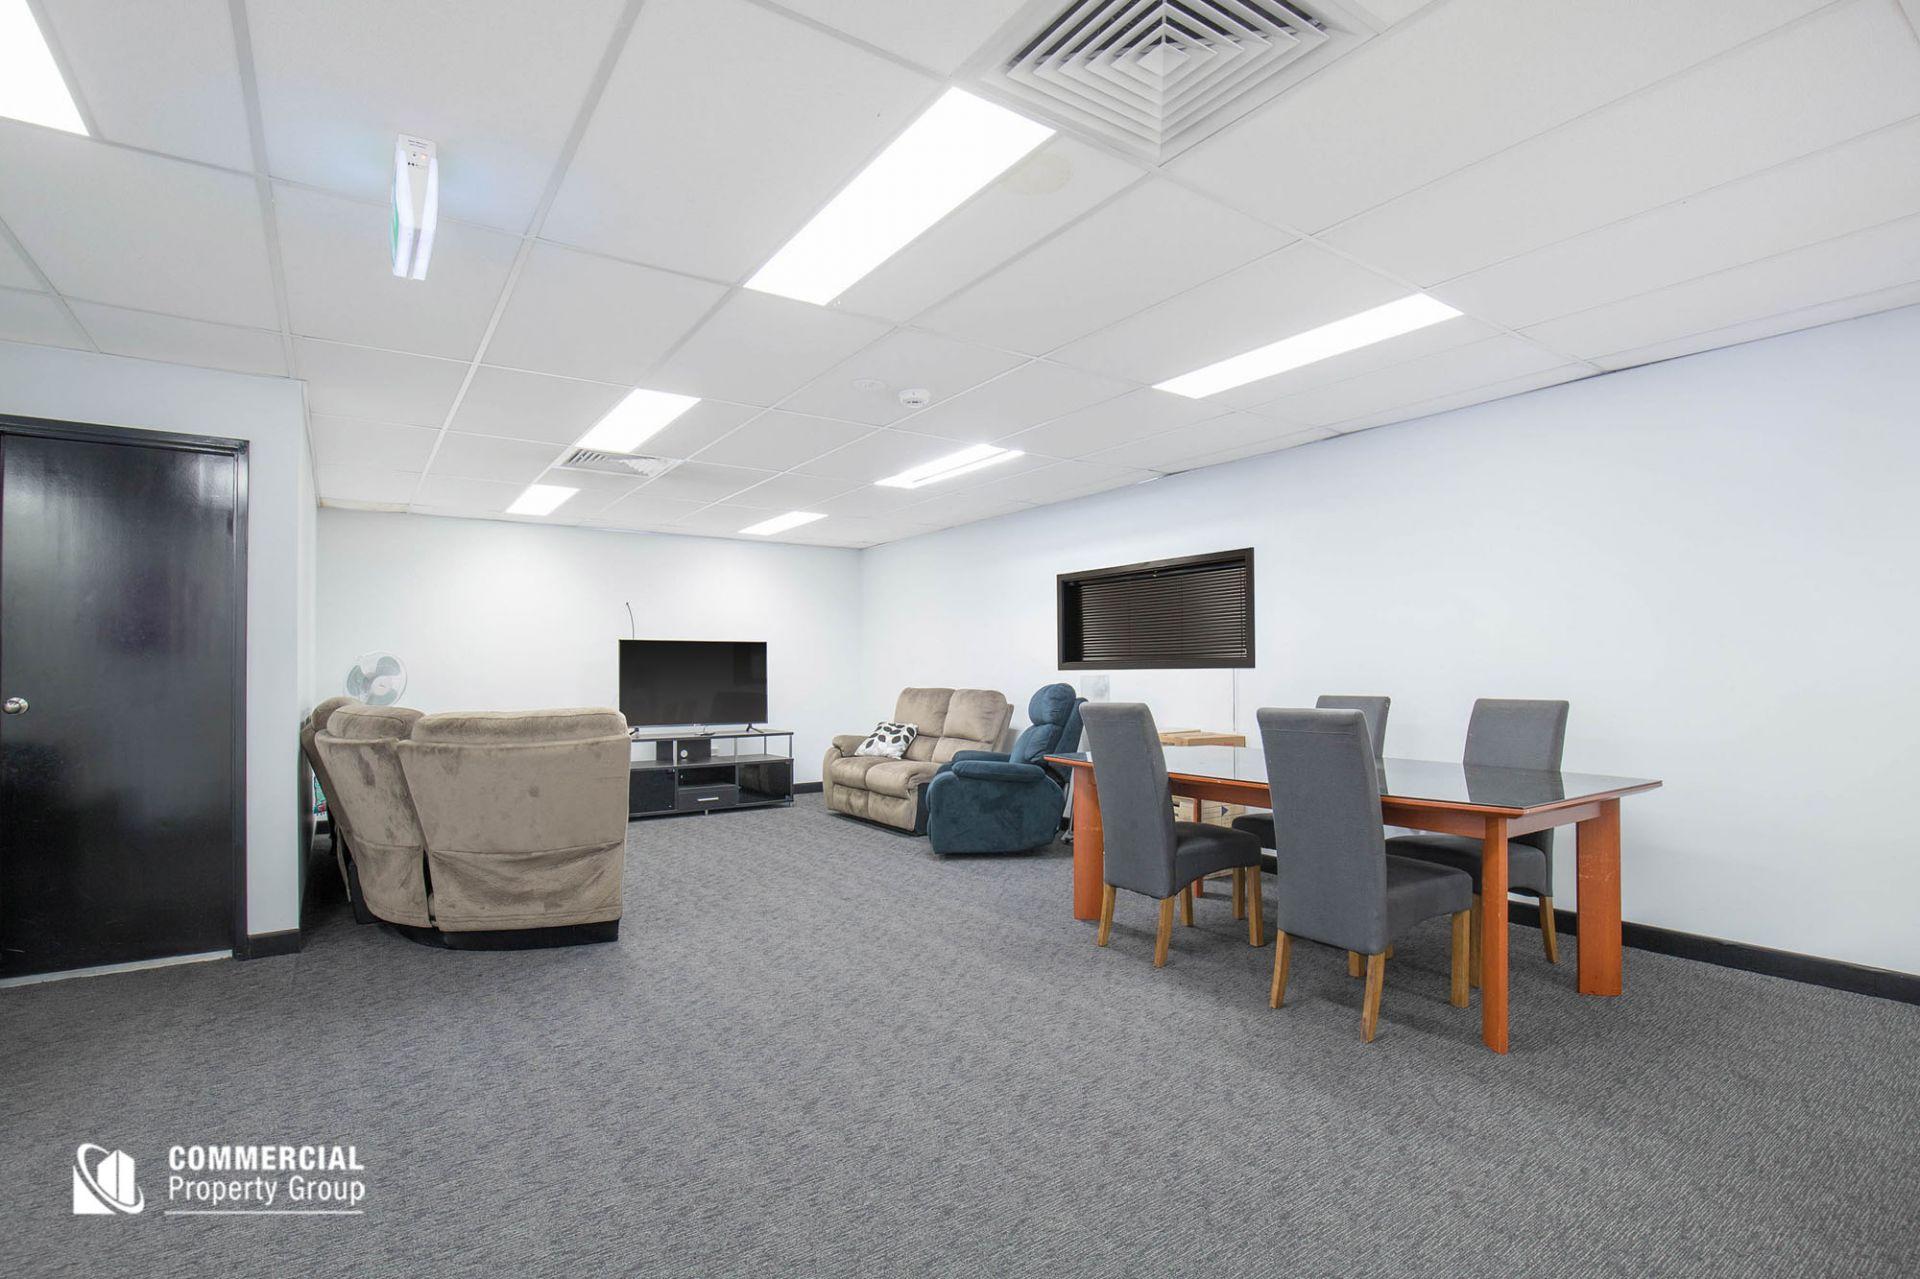 LEASED BY KYLE DEWEY - Impressive Industrial Corporate Headquarters